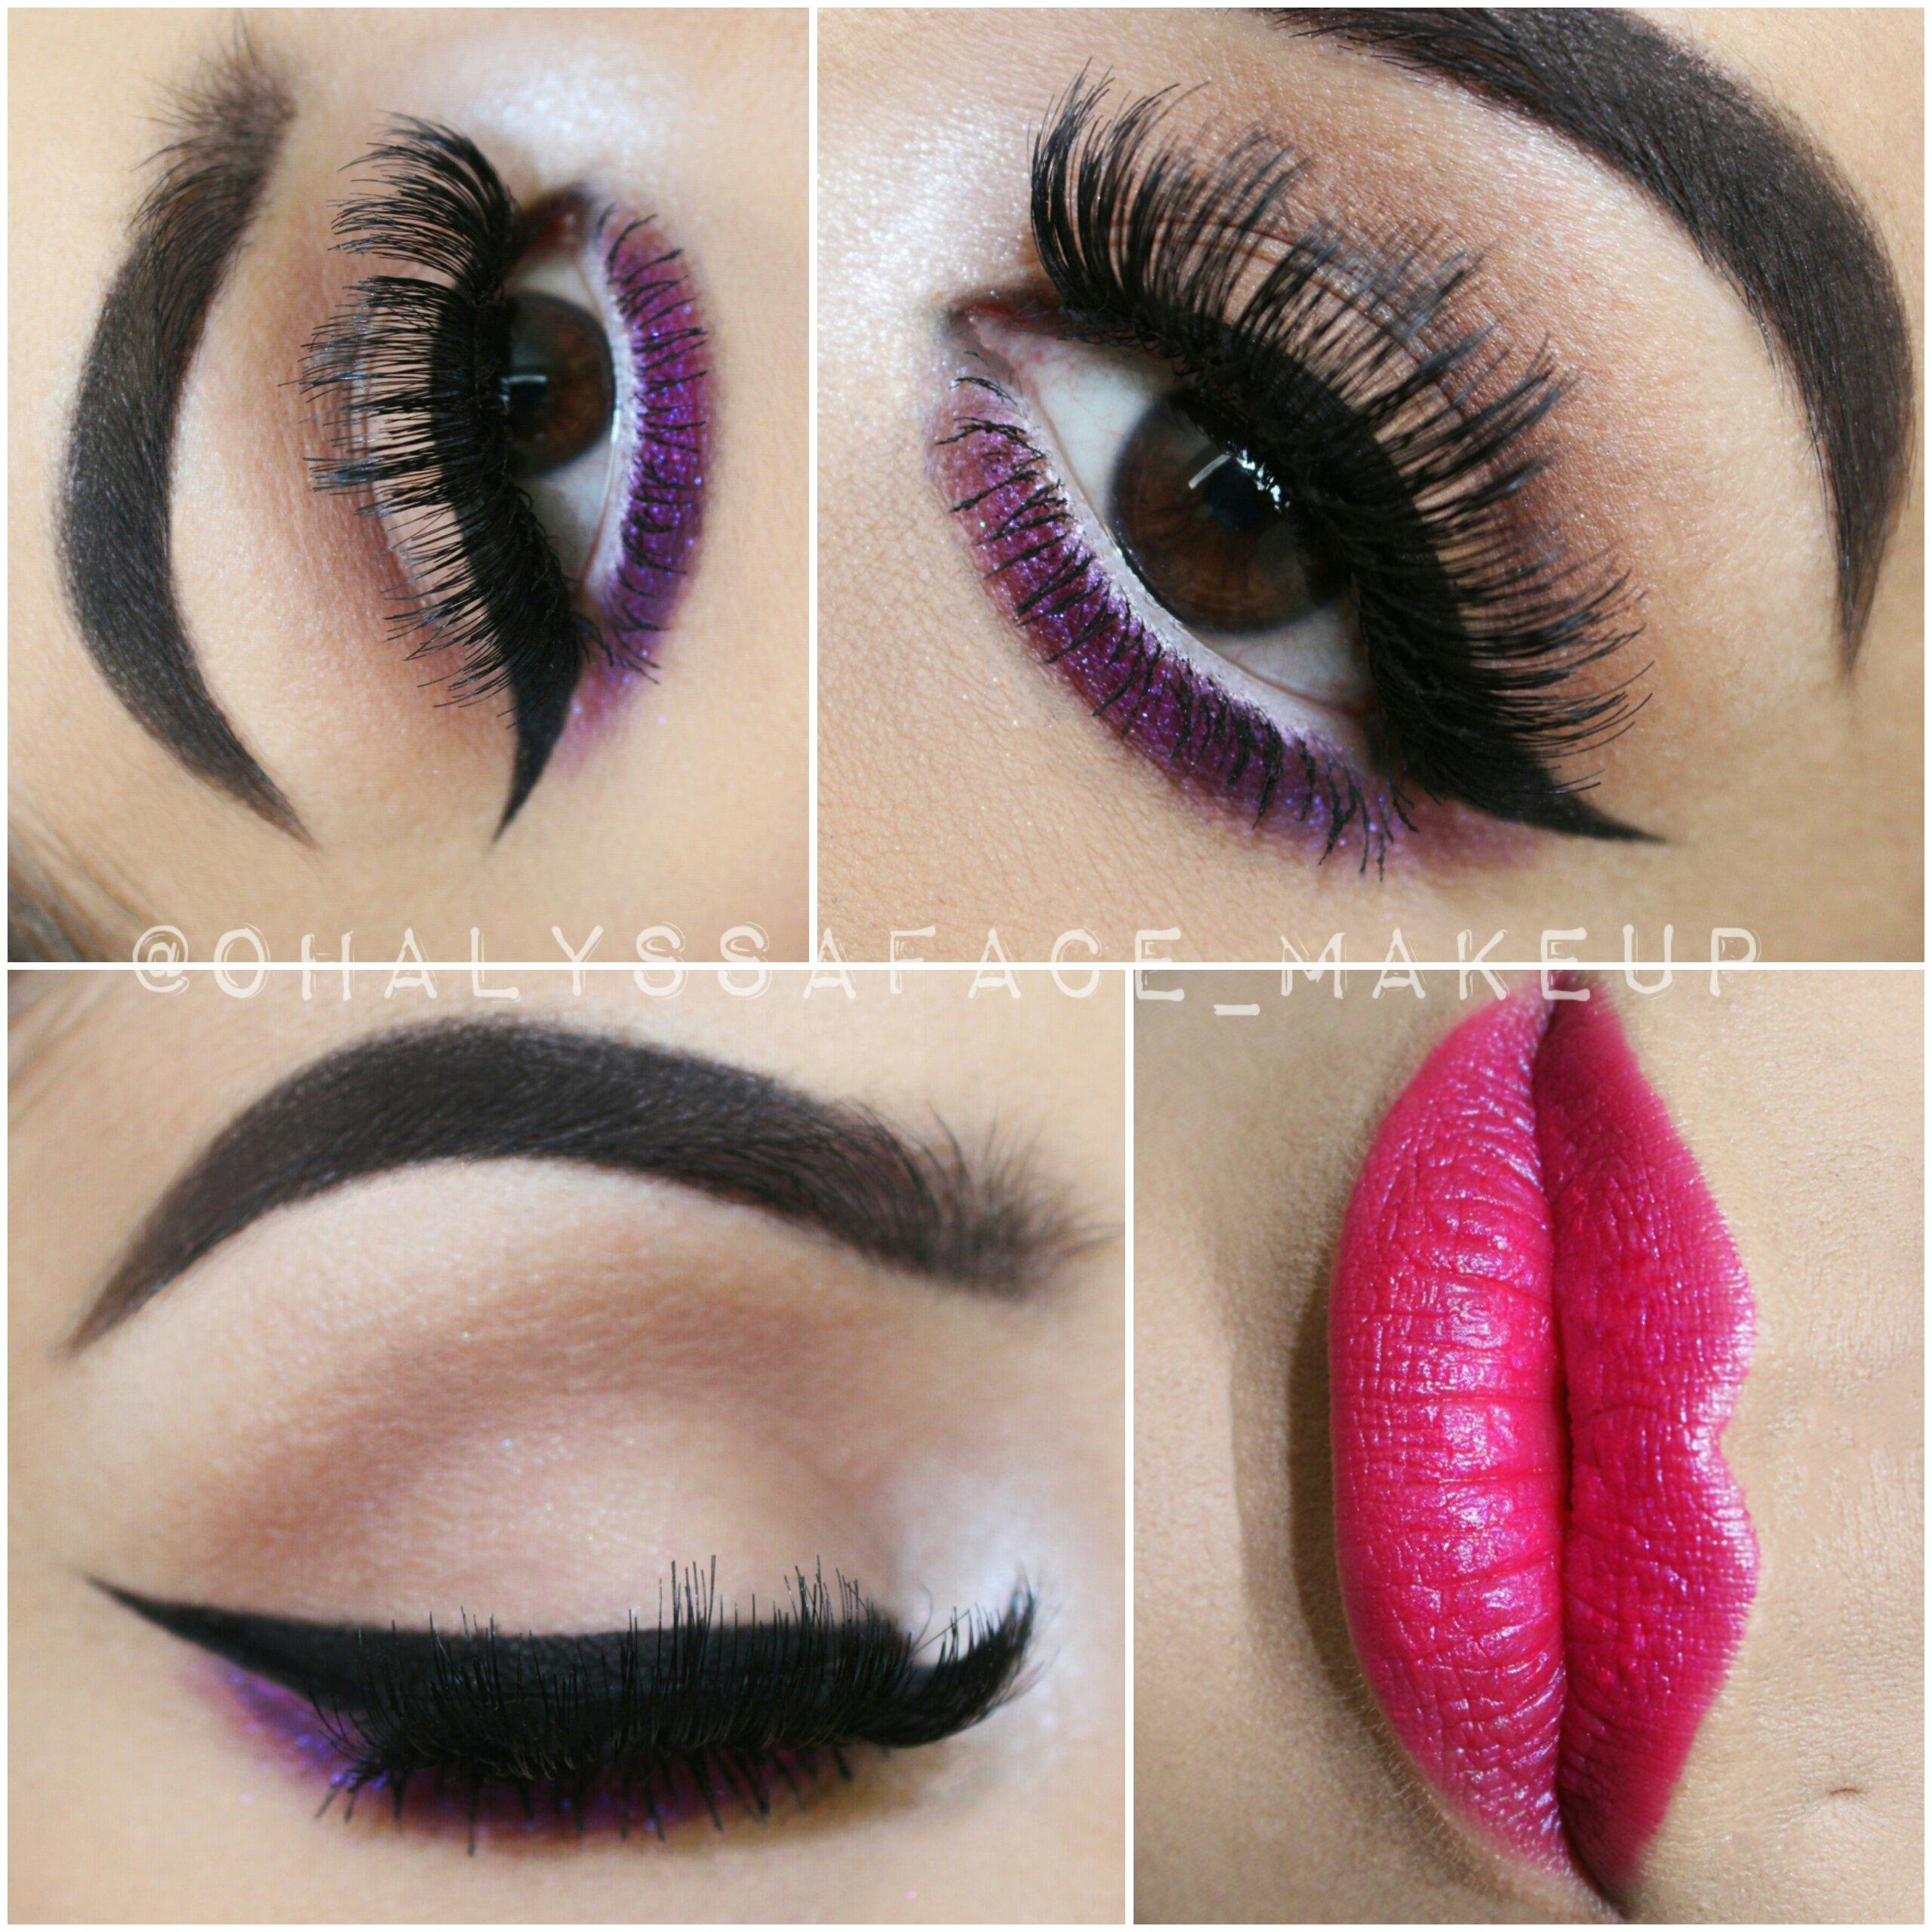 cea305f3eca Makeup Geek foiled shadows Makeup Geek Cosmetics Ardell Lashes Ardell  DoubleUps ColourPop Cosmetics Super Shock Shadows